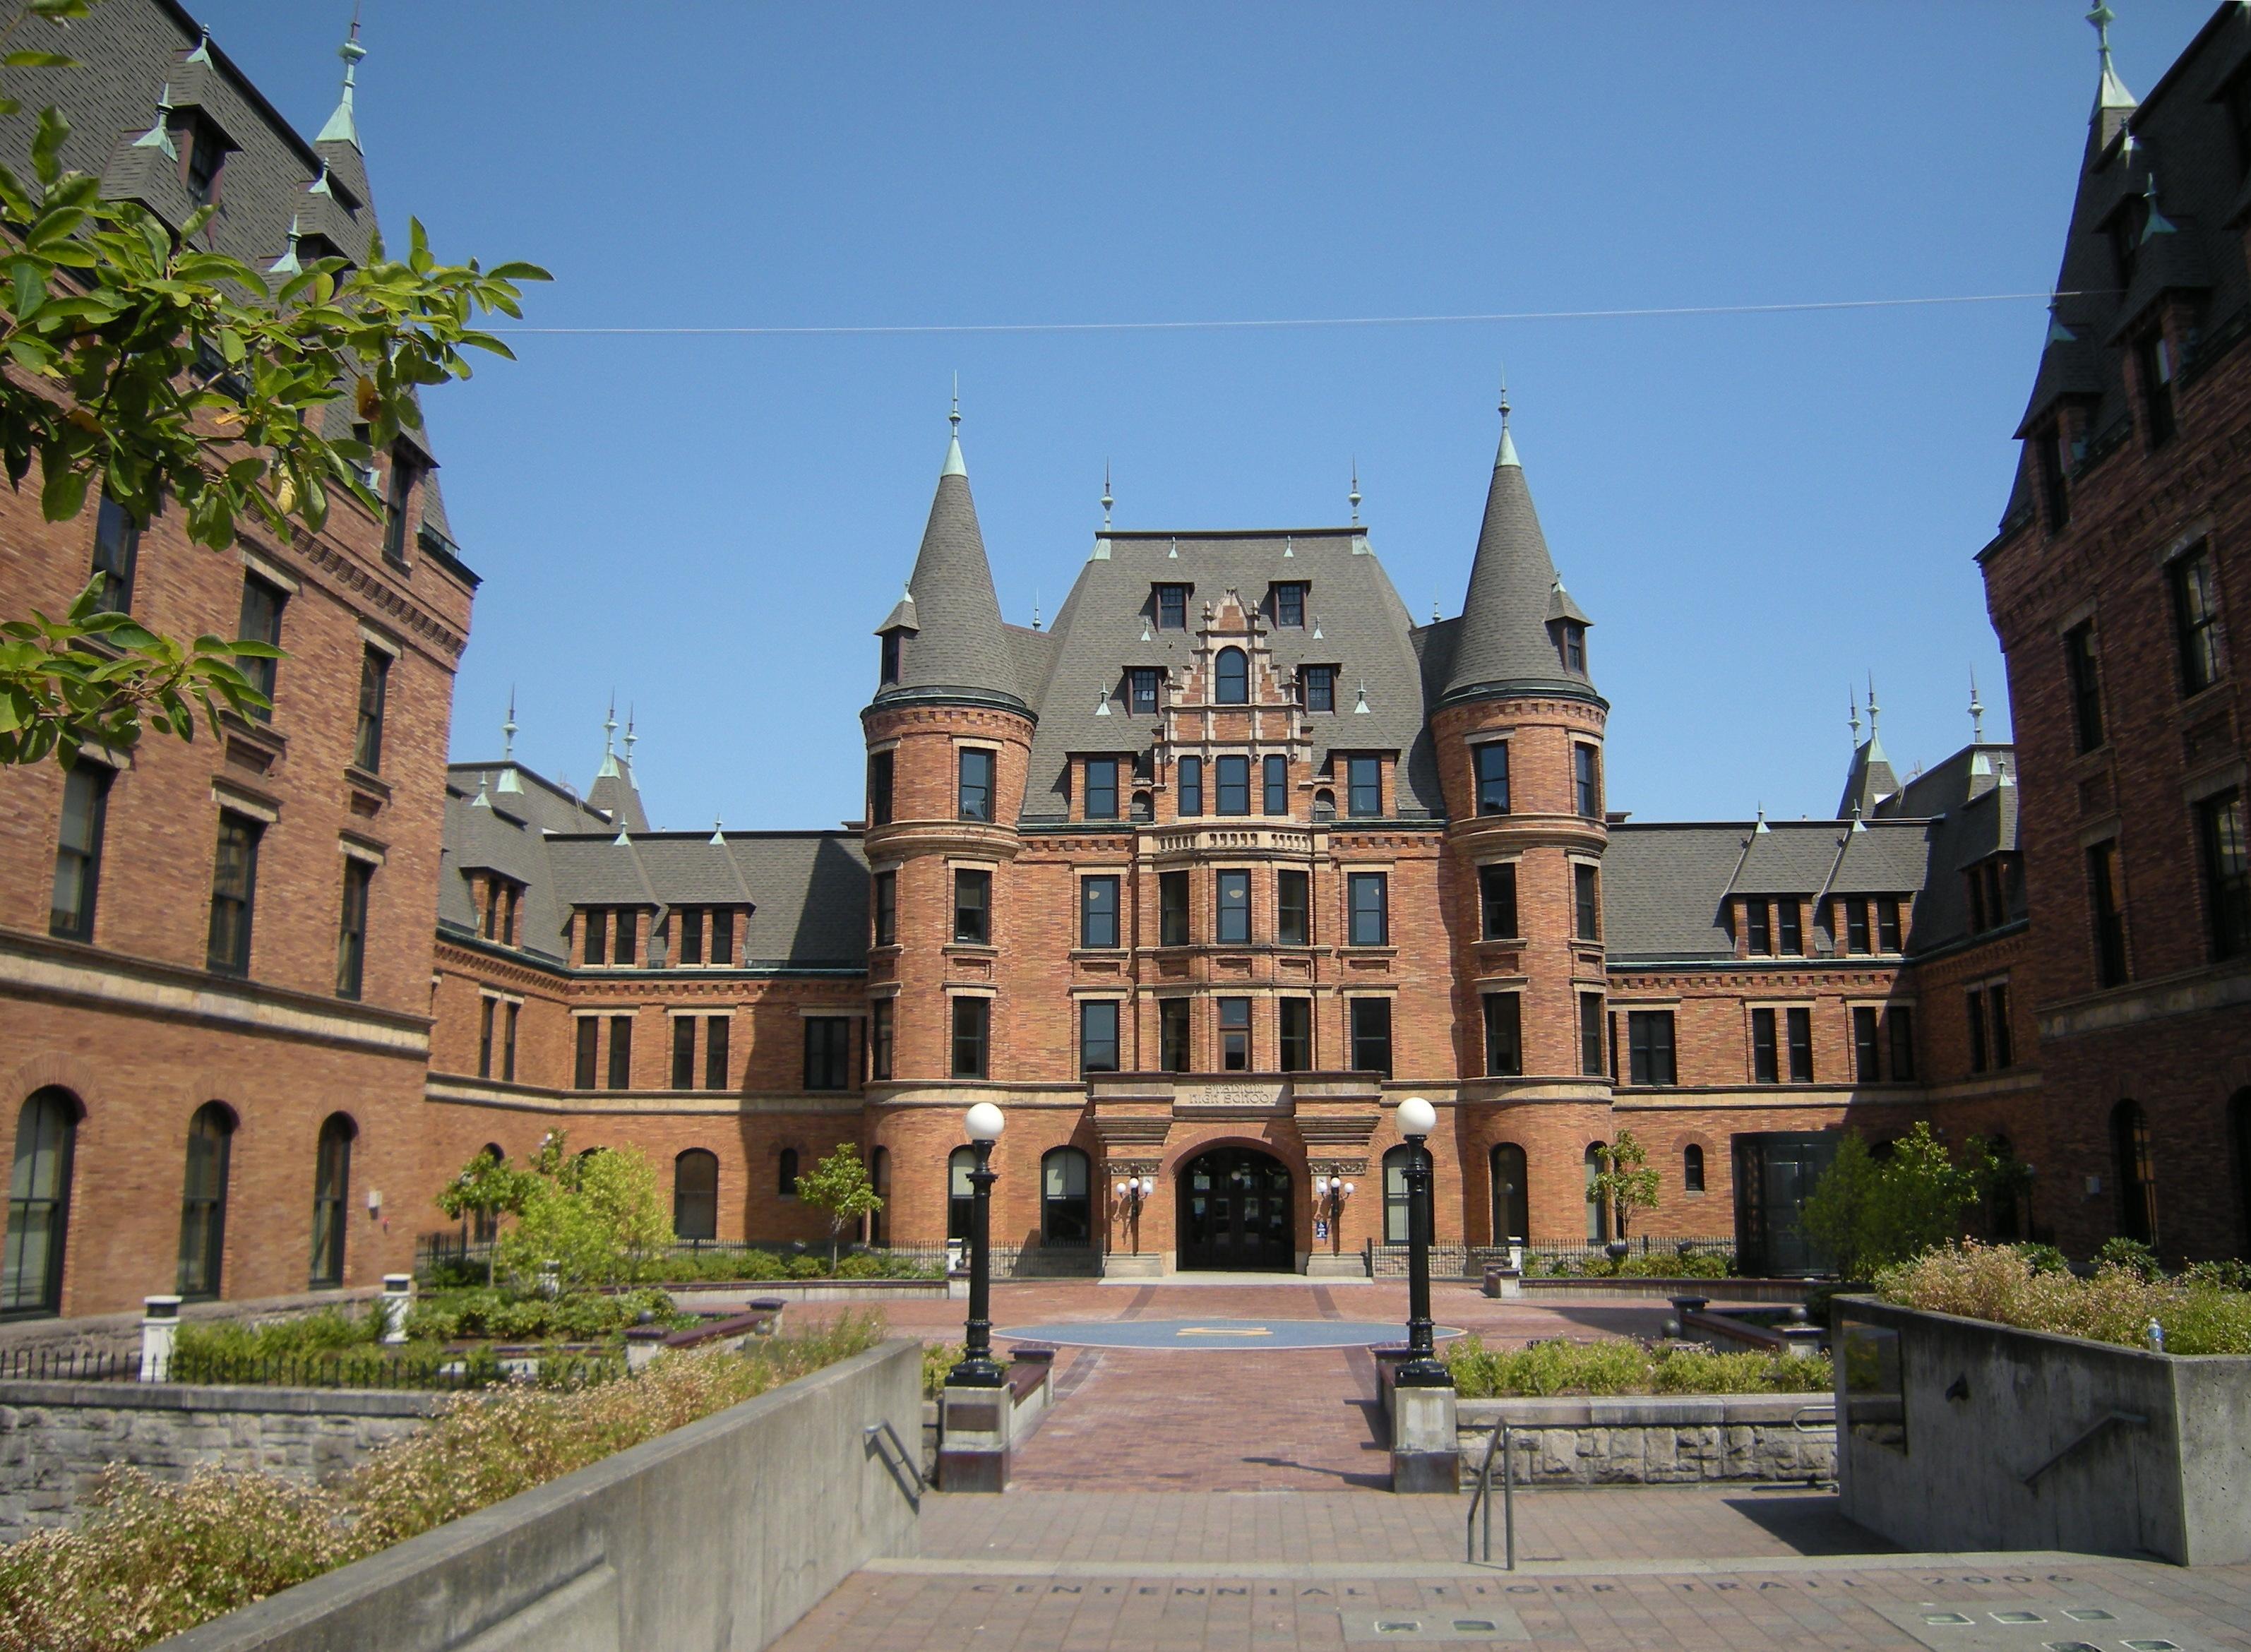 City Hall Castle Rock Wa